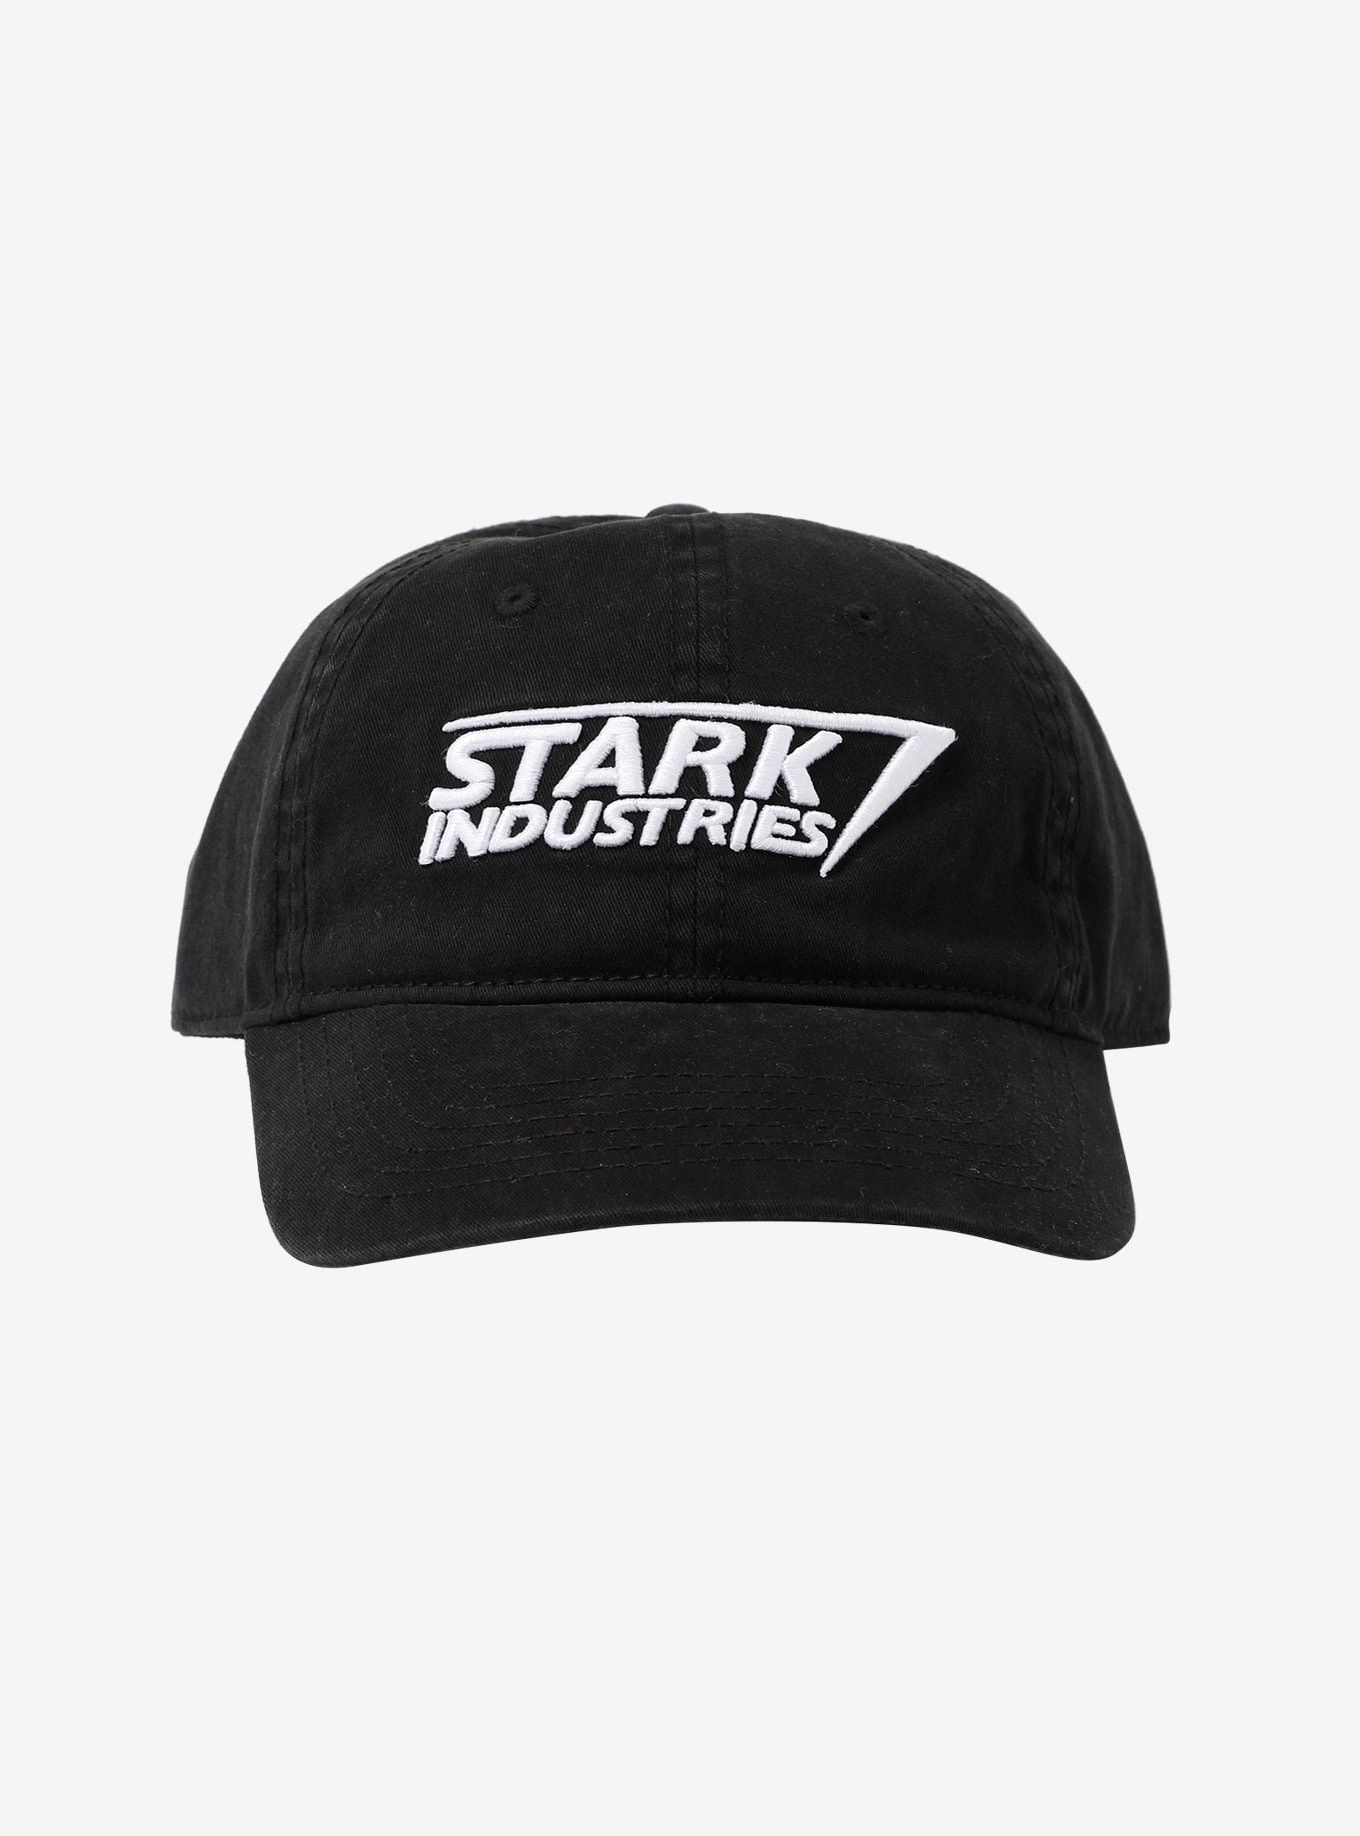 best website 2fbfc 4916e Stark Industries hat